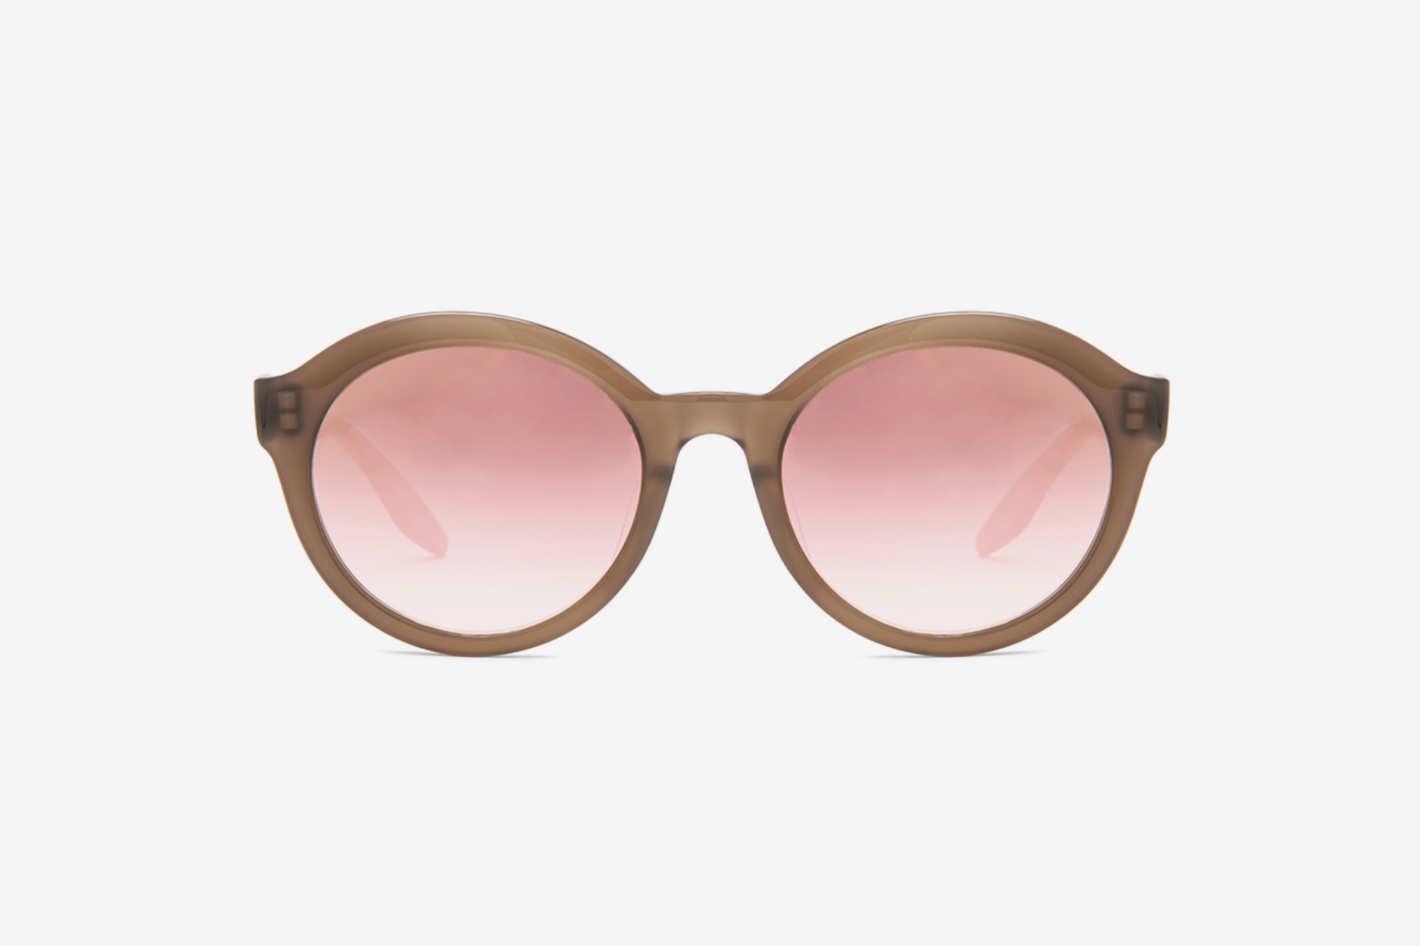 Barton Perreira for FWRD Carnaby Sunglasses